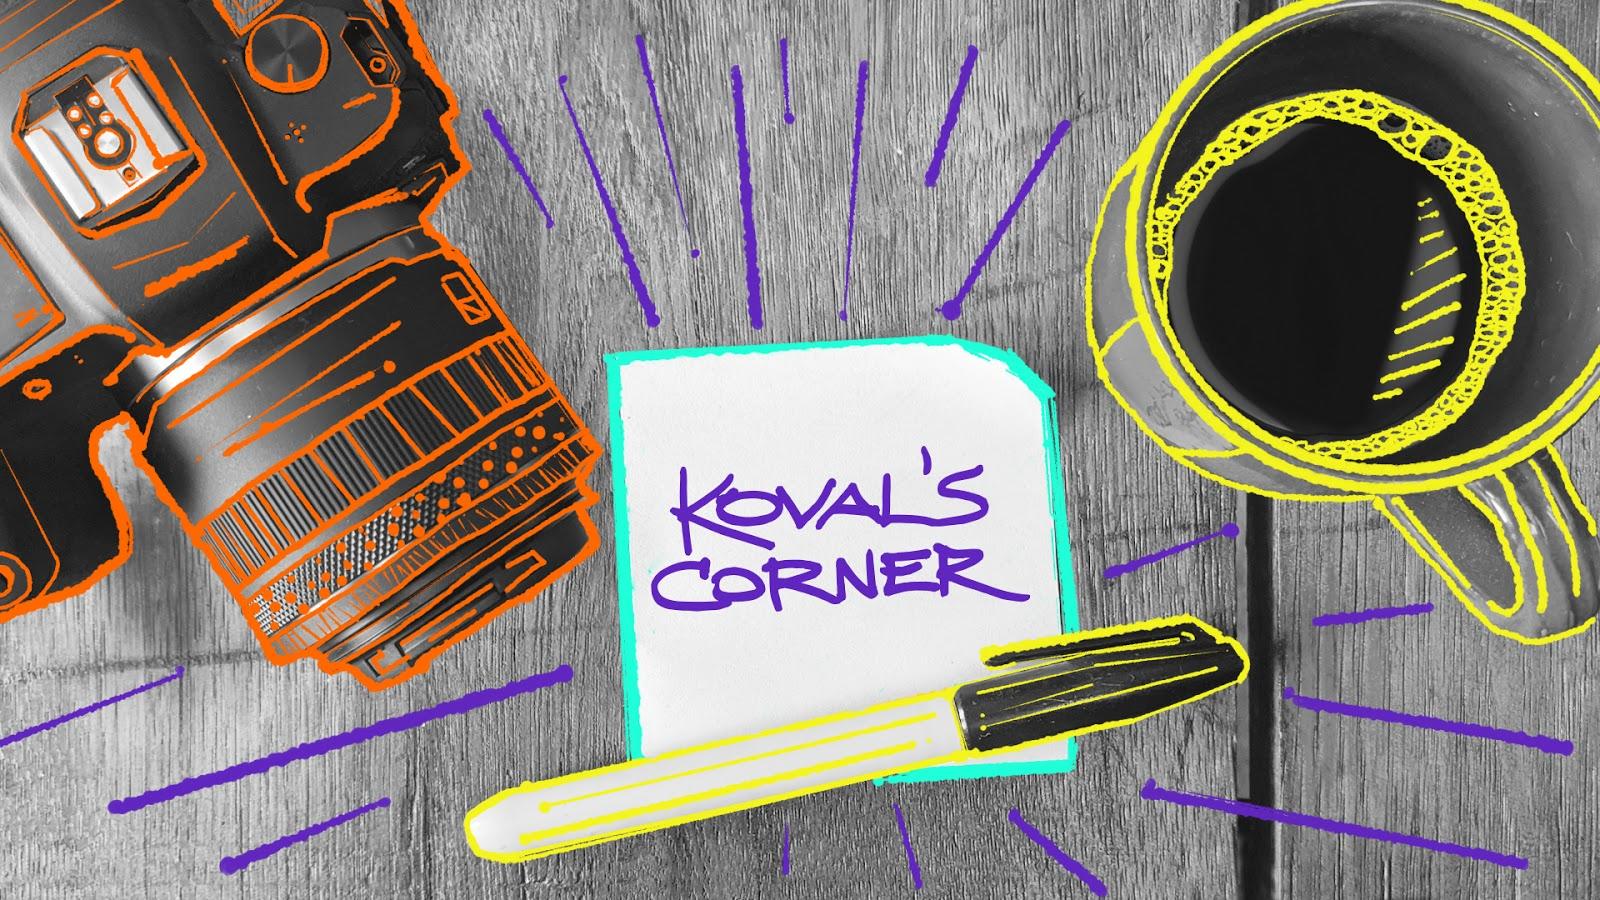 Koval's Corner: Creator on the inside